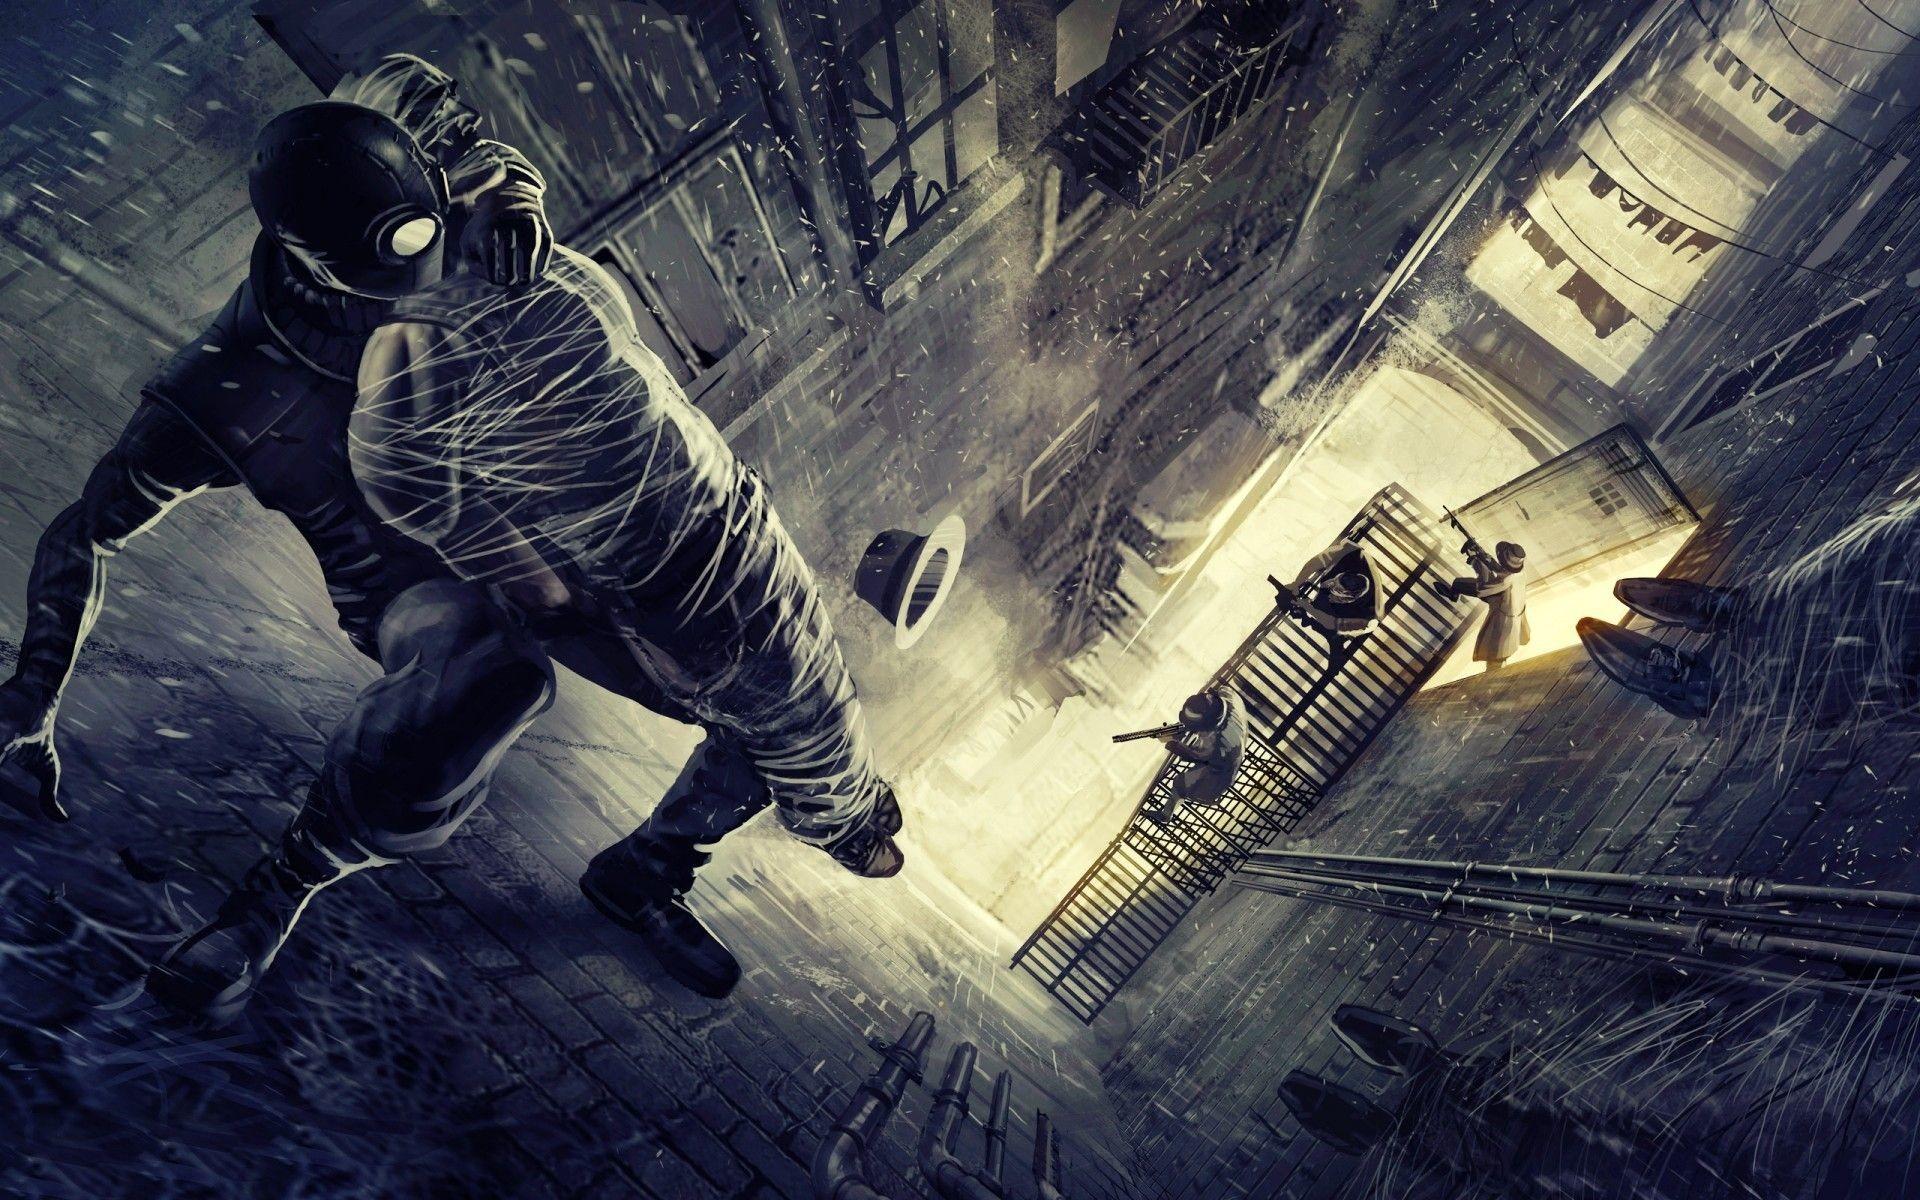 Black Spiderman Wallpaper ·① WallpaperTag